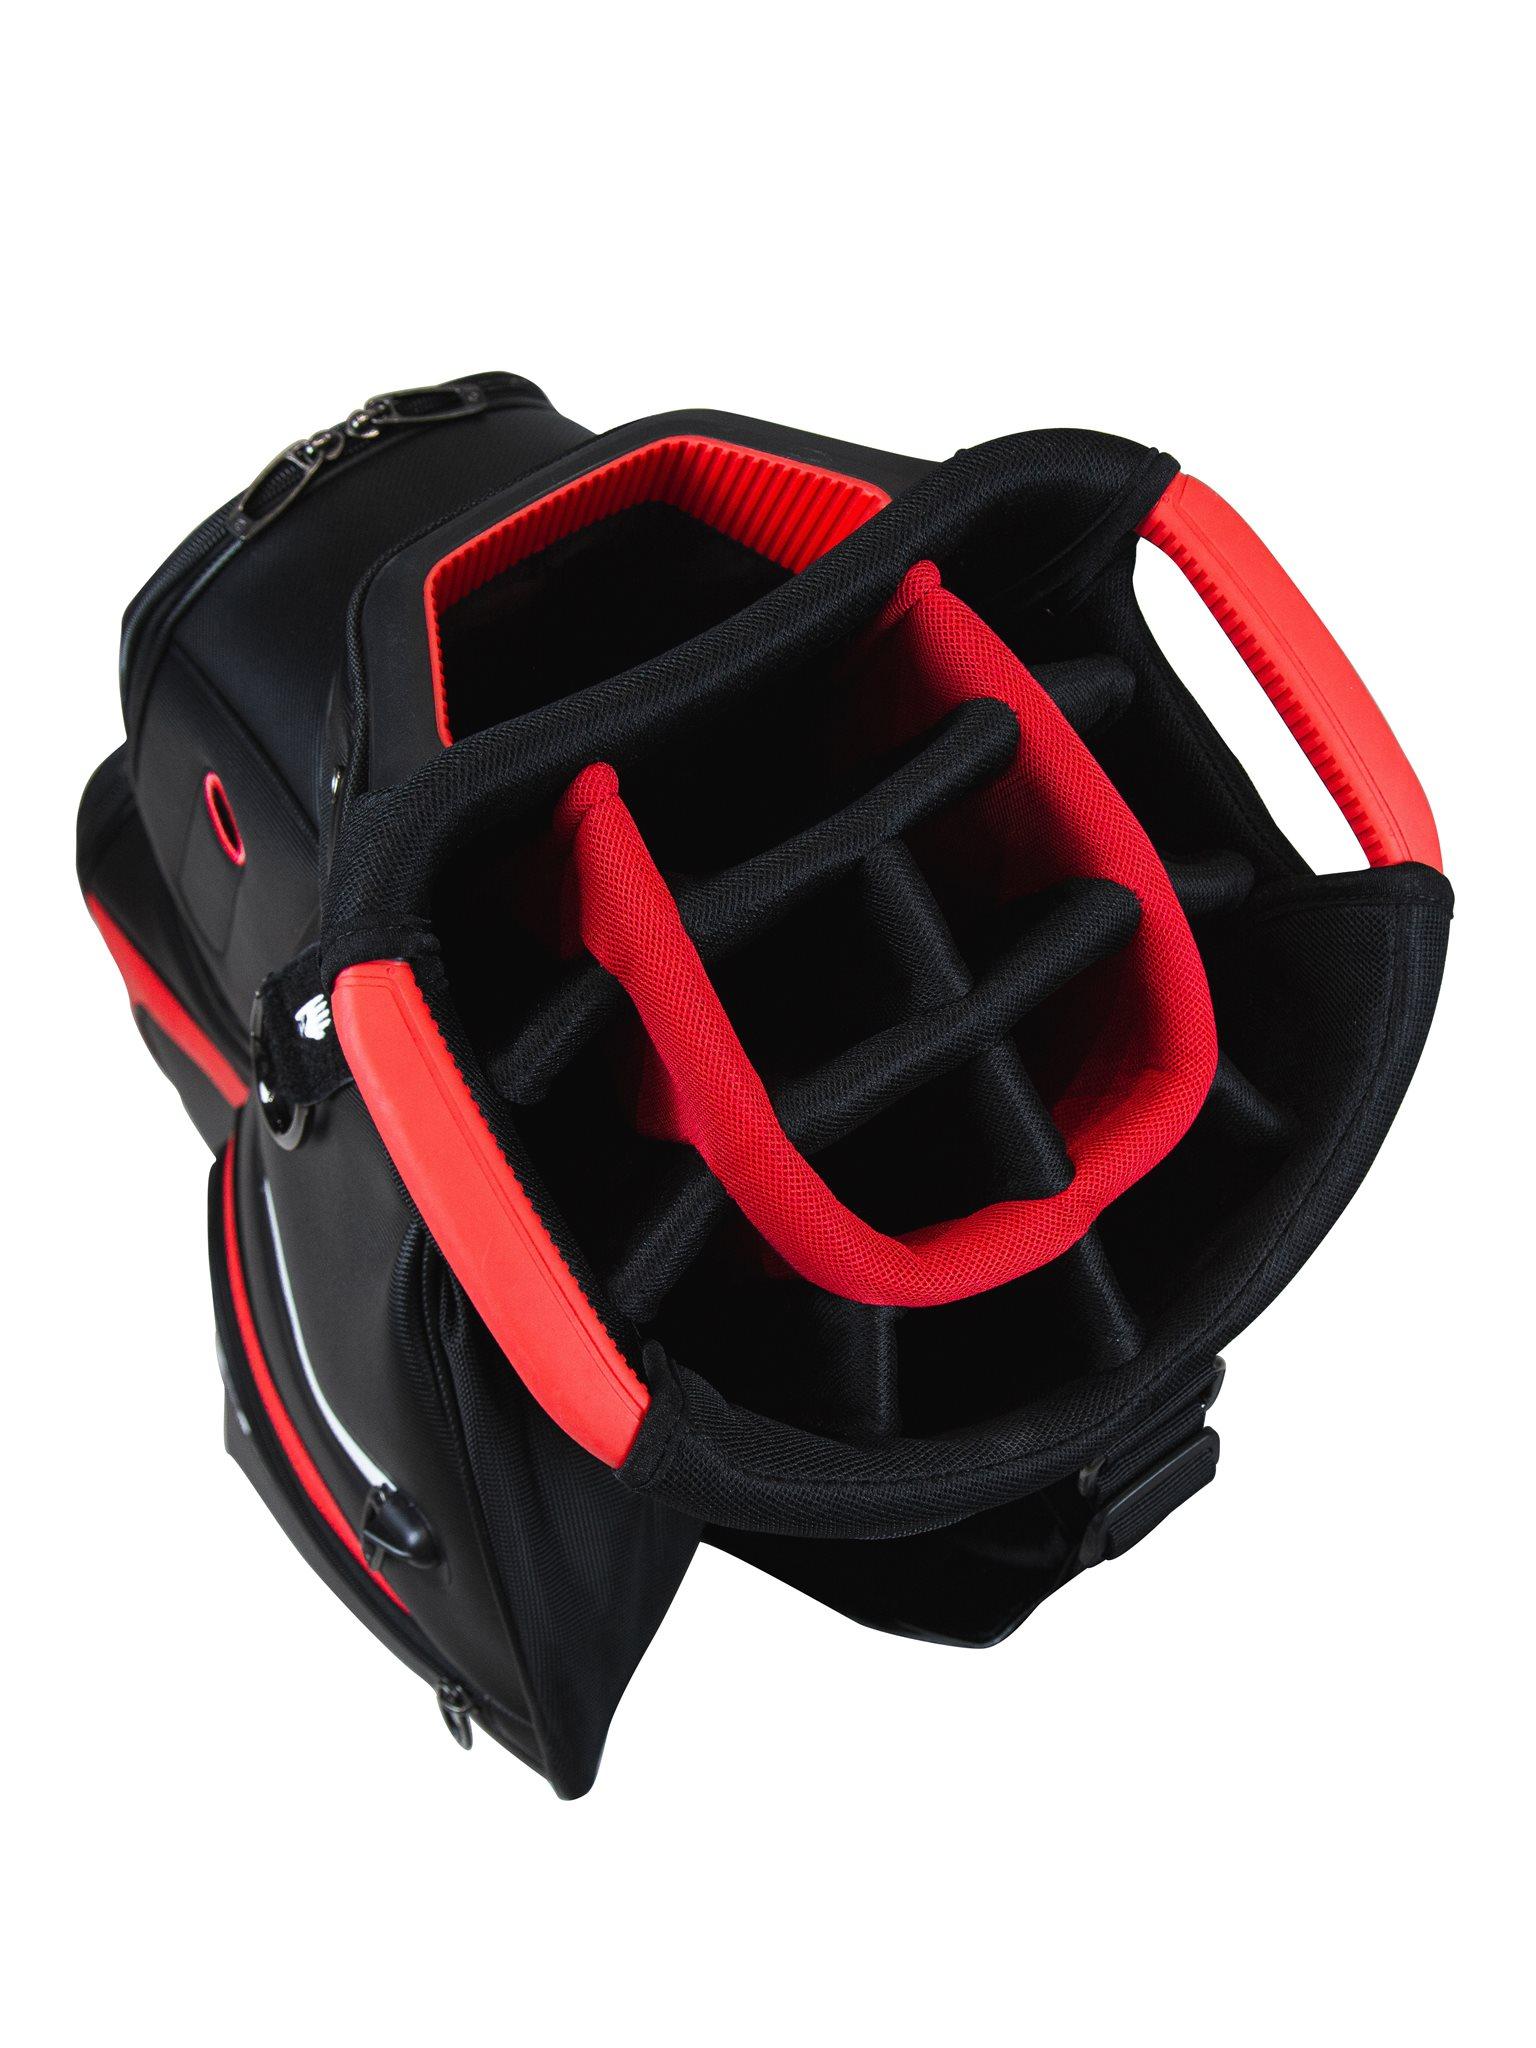 TaylorMade golftas Deluxe Cart Bag zwart-rood